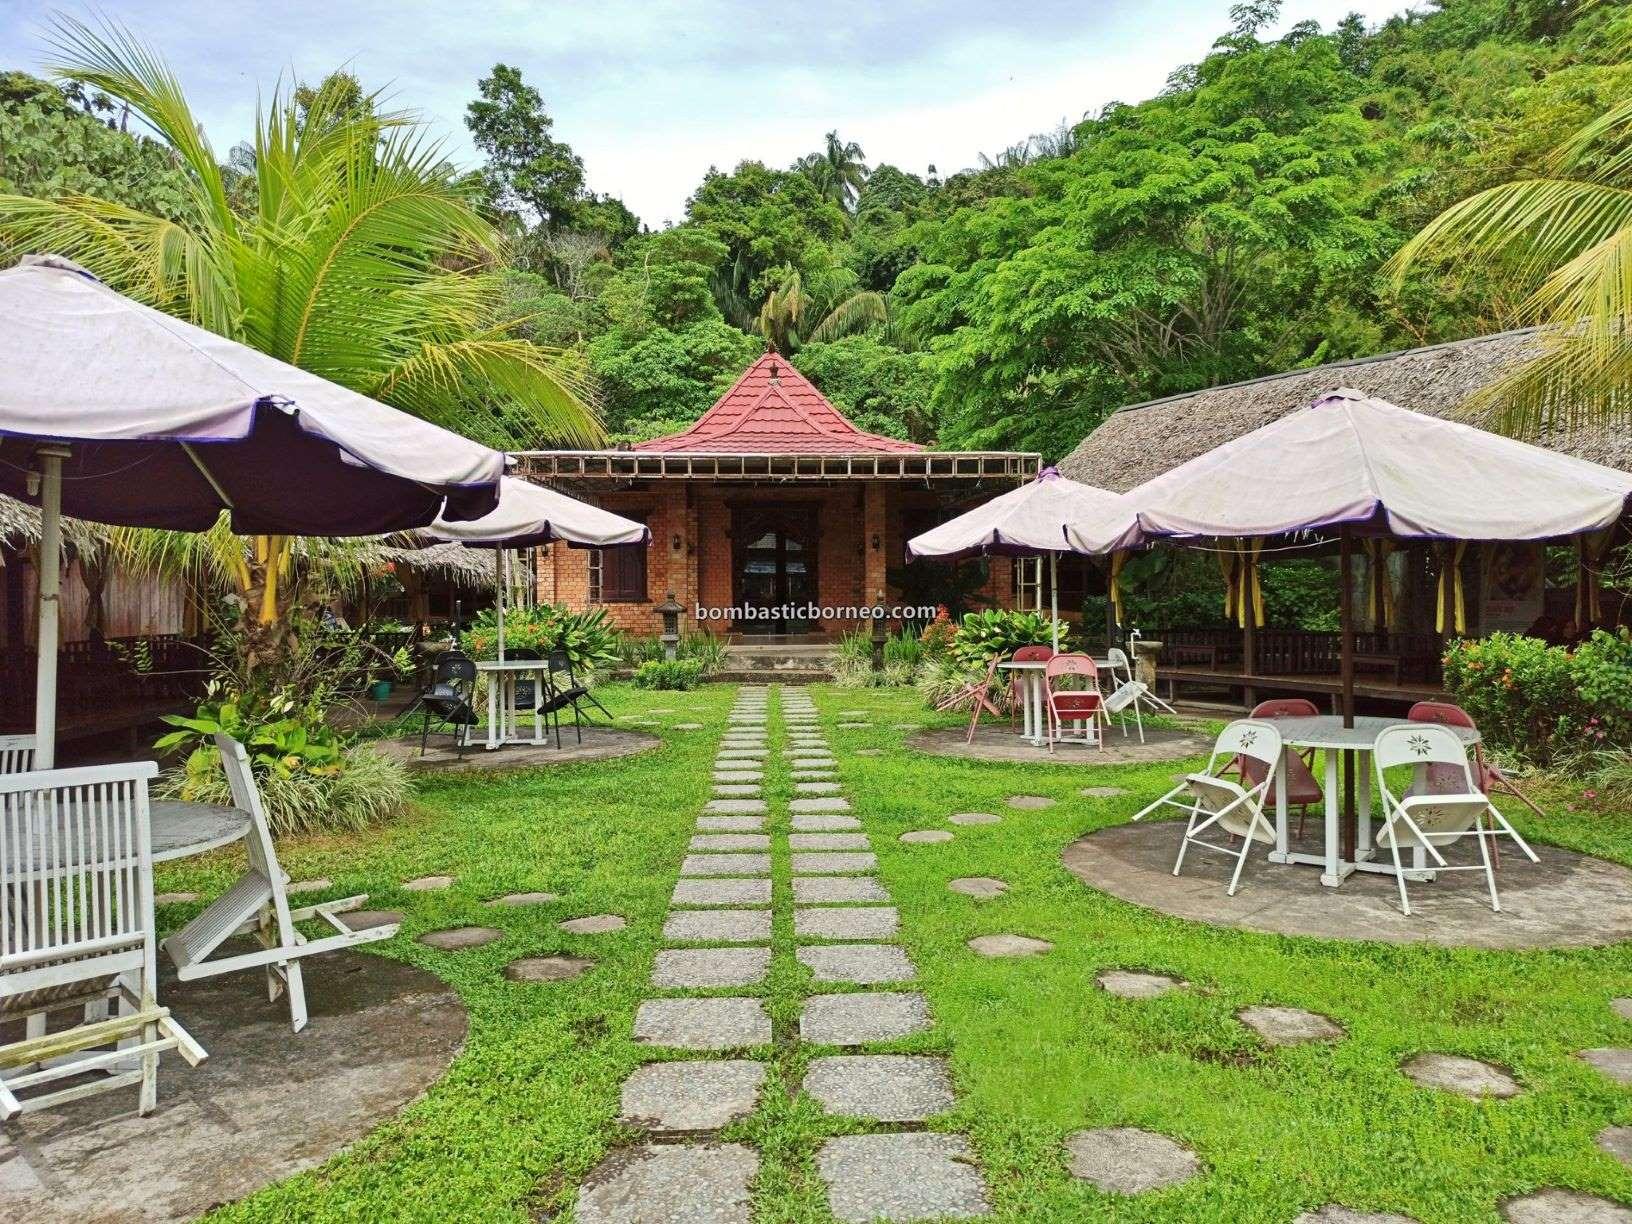 restorant, antique, backpackers, destination, exploration, Indonesia, Kalimantan Utara, Kaltara, Kota Tarakan, Malabar Cafe, Pariwisata, Tourism, tourist attraction, travel guide, Borneo,